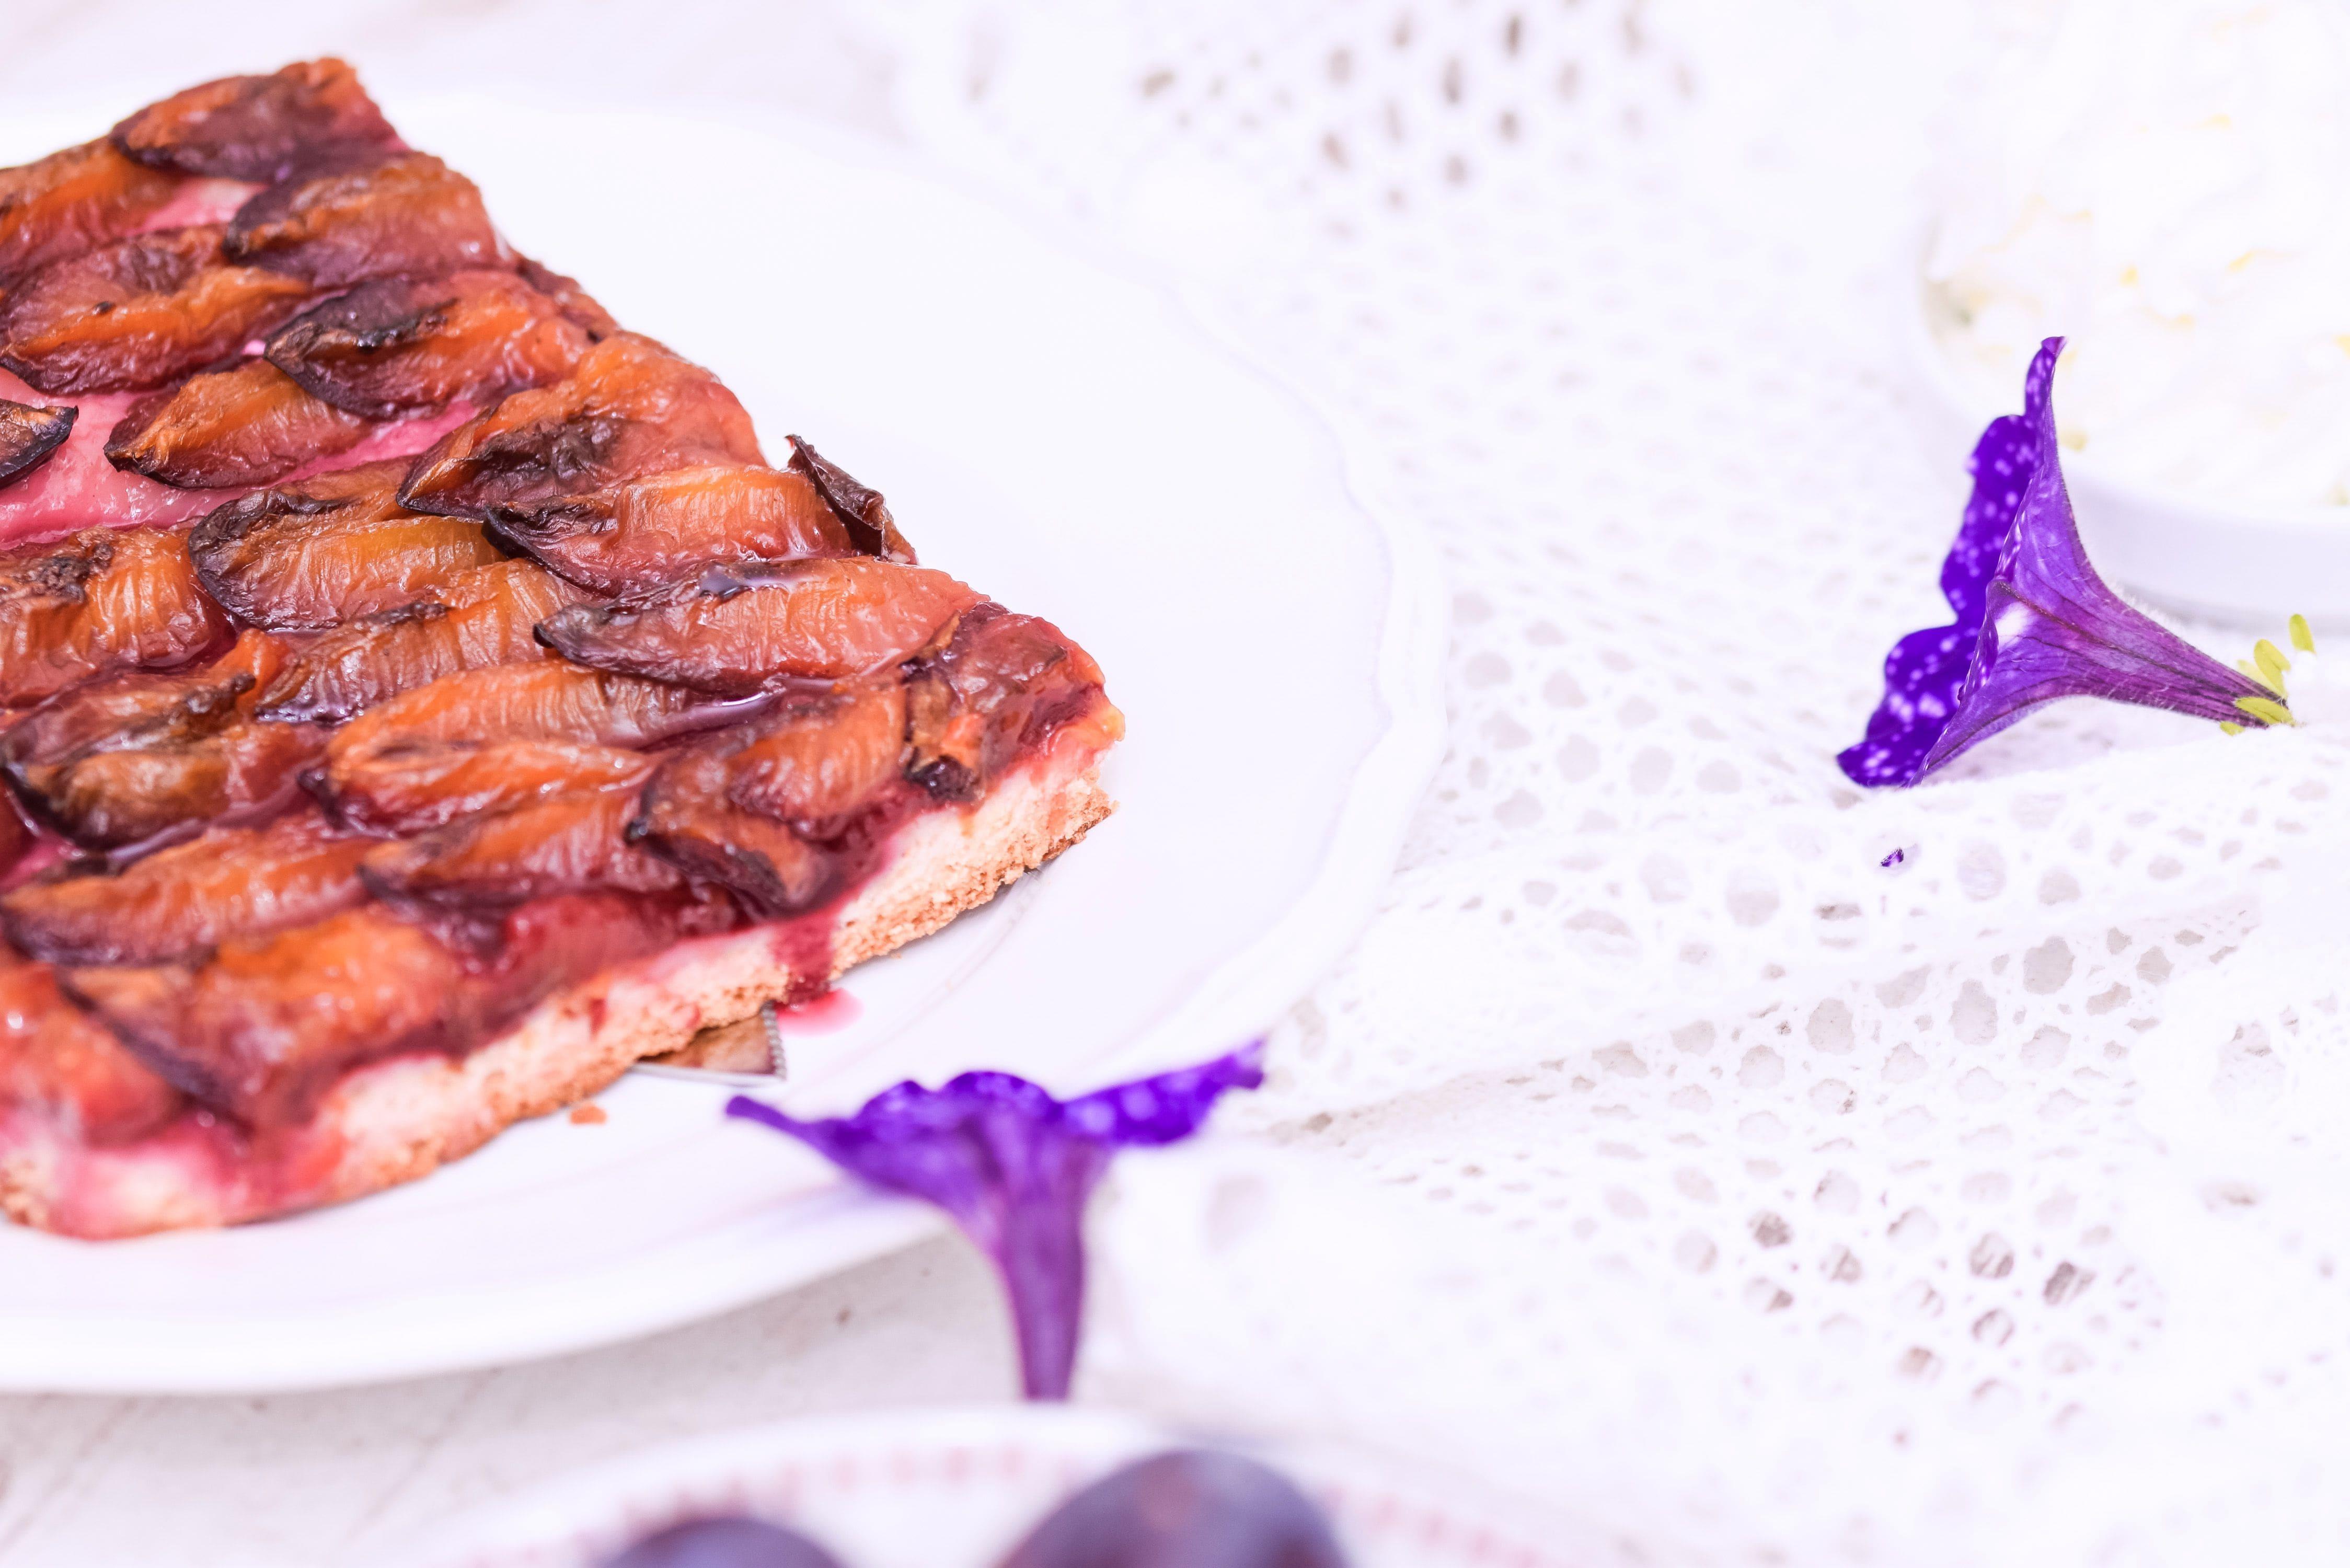 rezept-zwetschgenkuchen-selbstgemacht-hefeteig-missfancy-foodblog-min